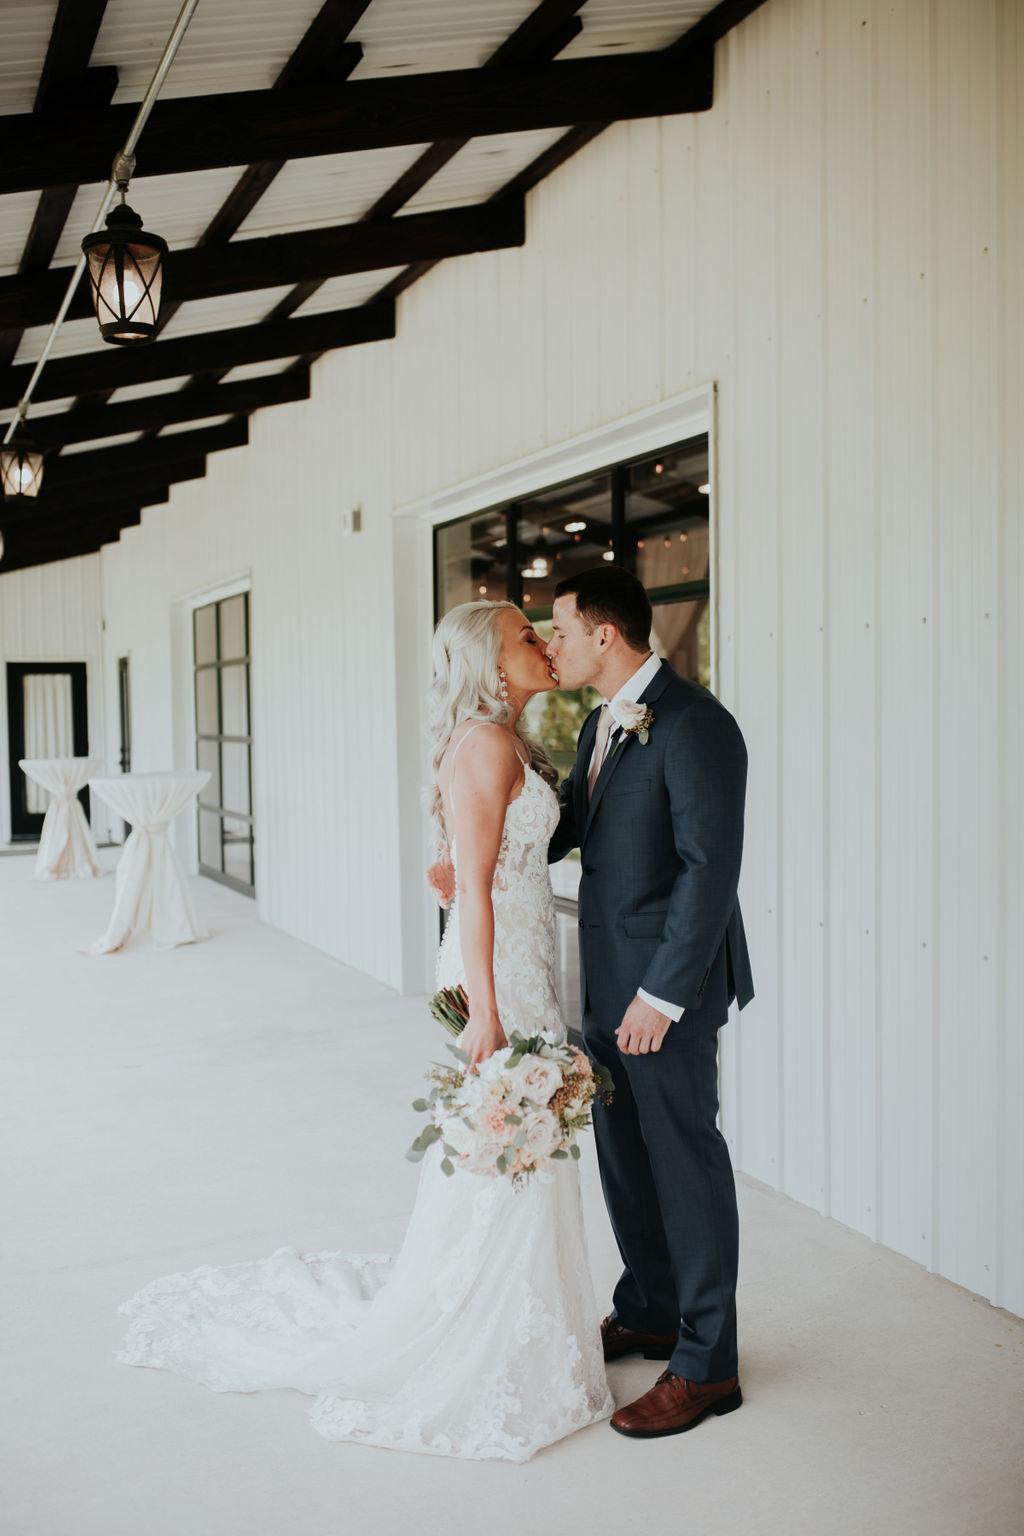 Best Oklahoma Outdoor Wedding Venue Tulsa Bixby White Barn 12.jpg